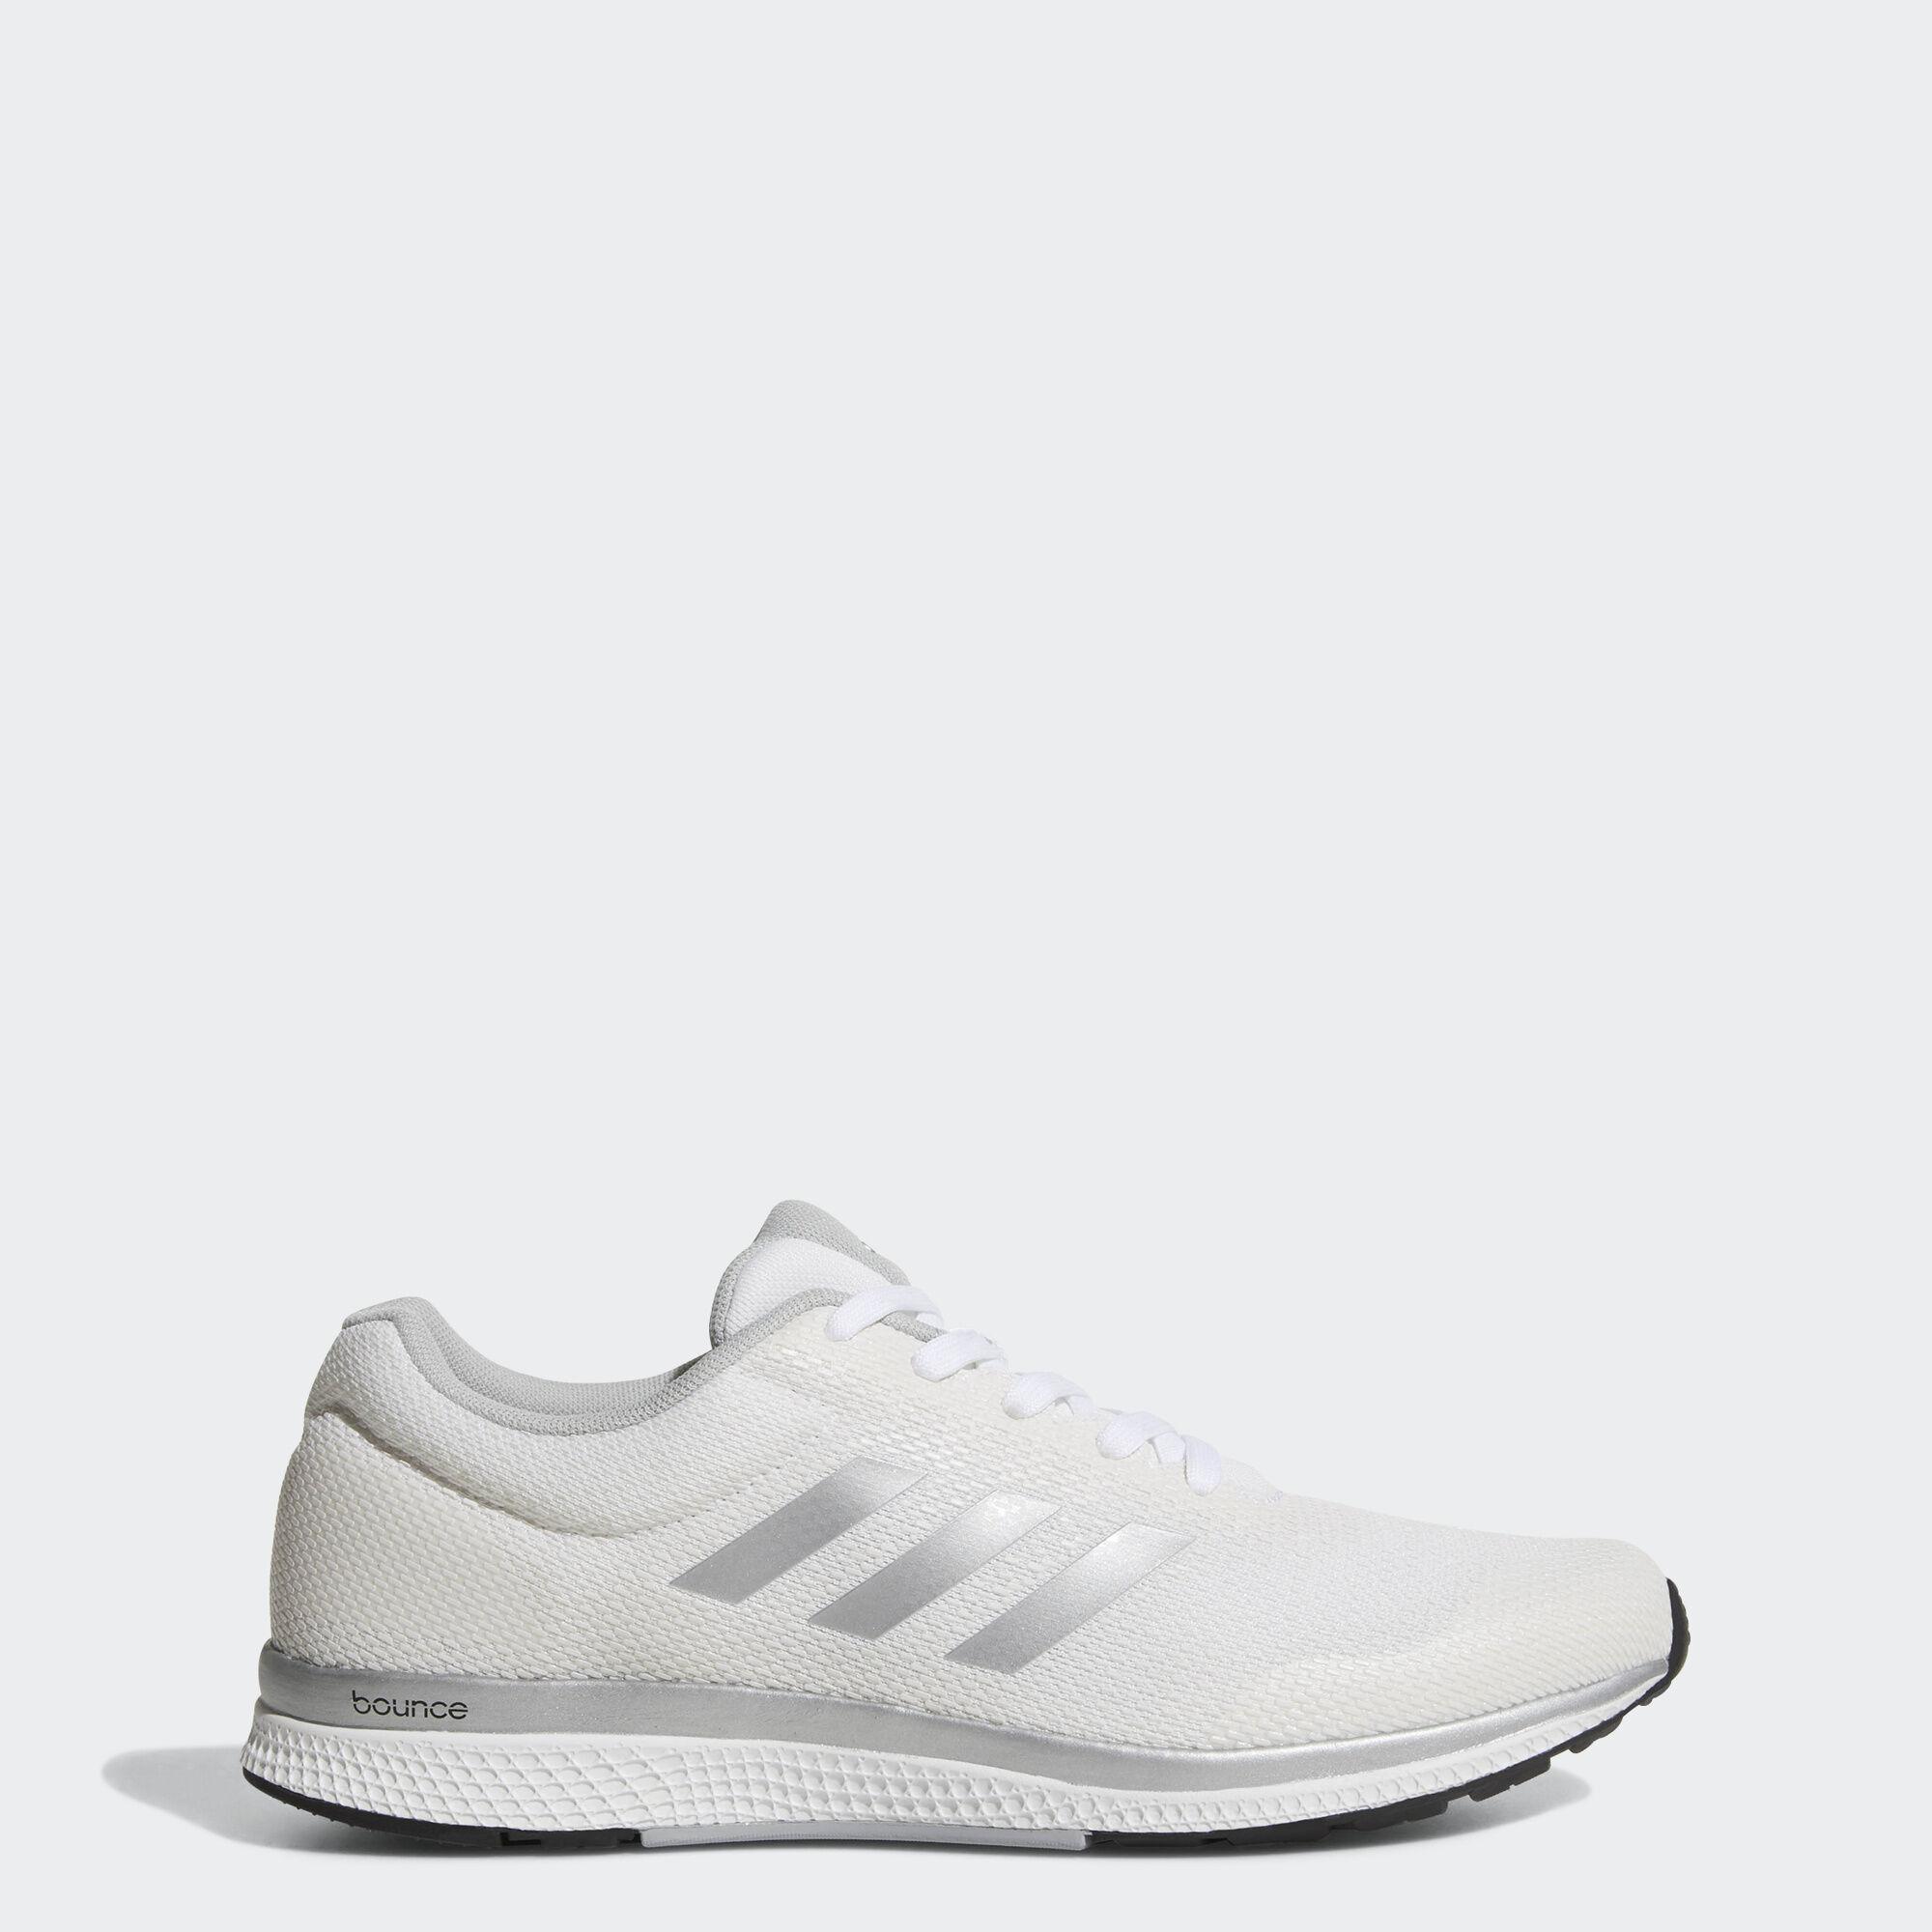 adidas 2.0 shoes